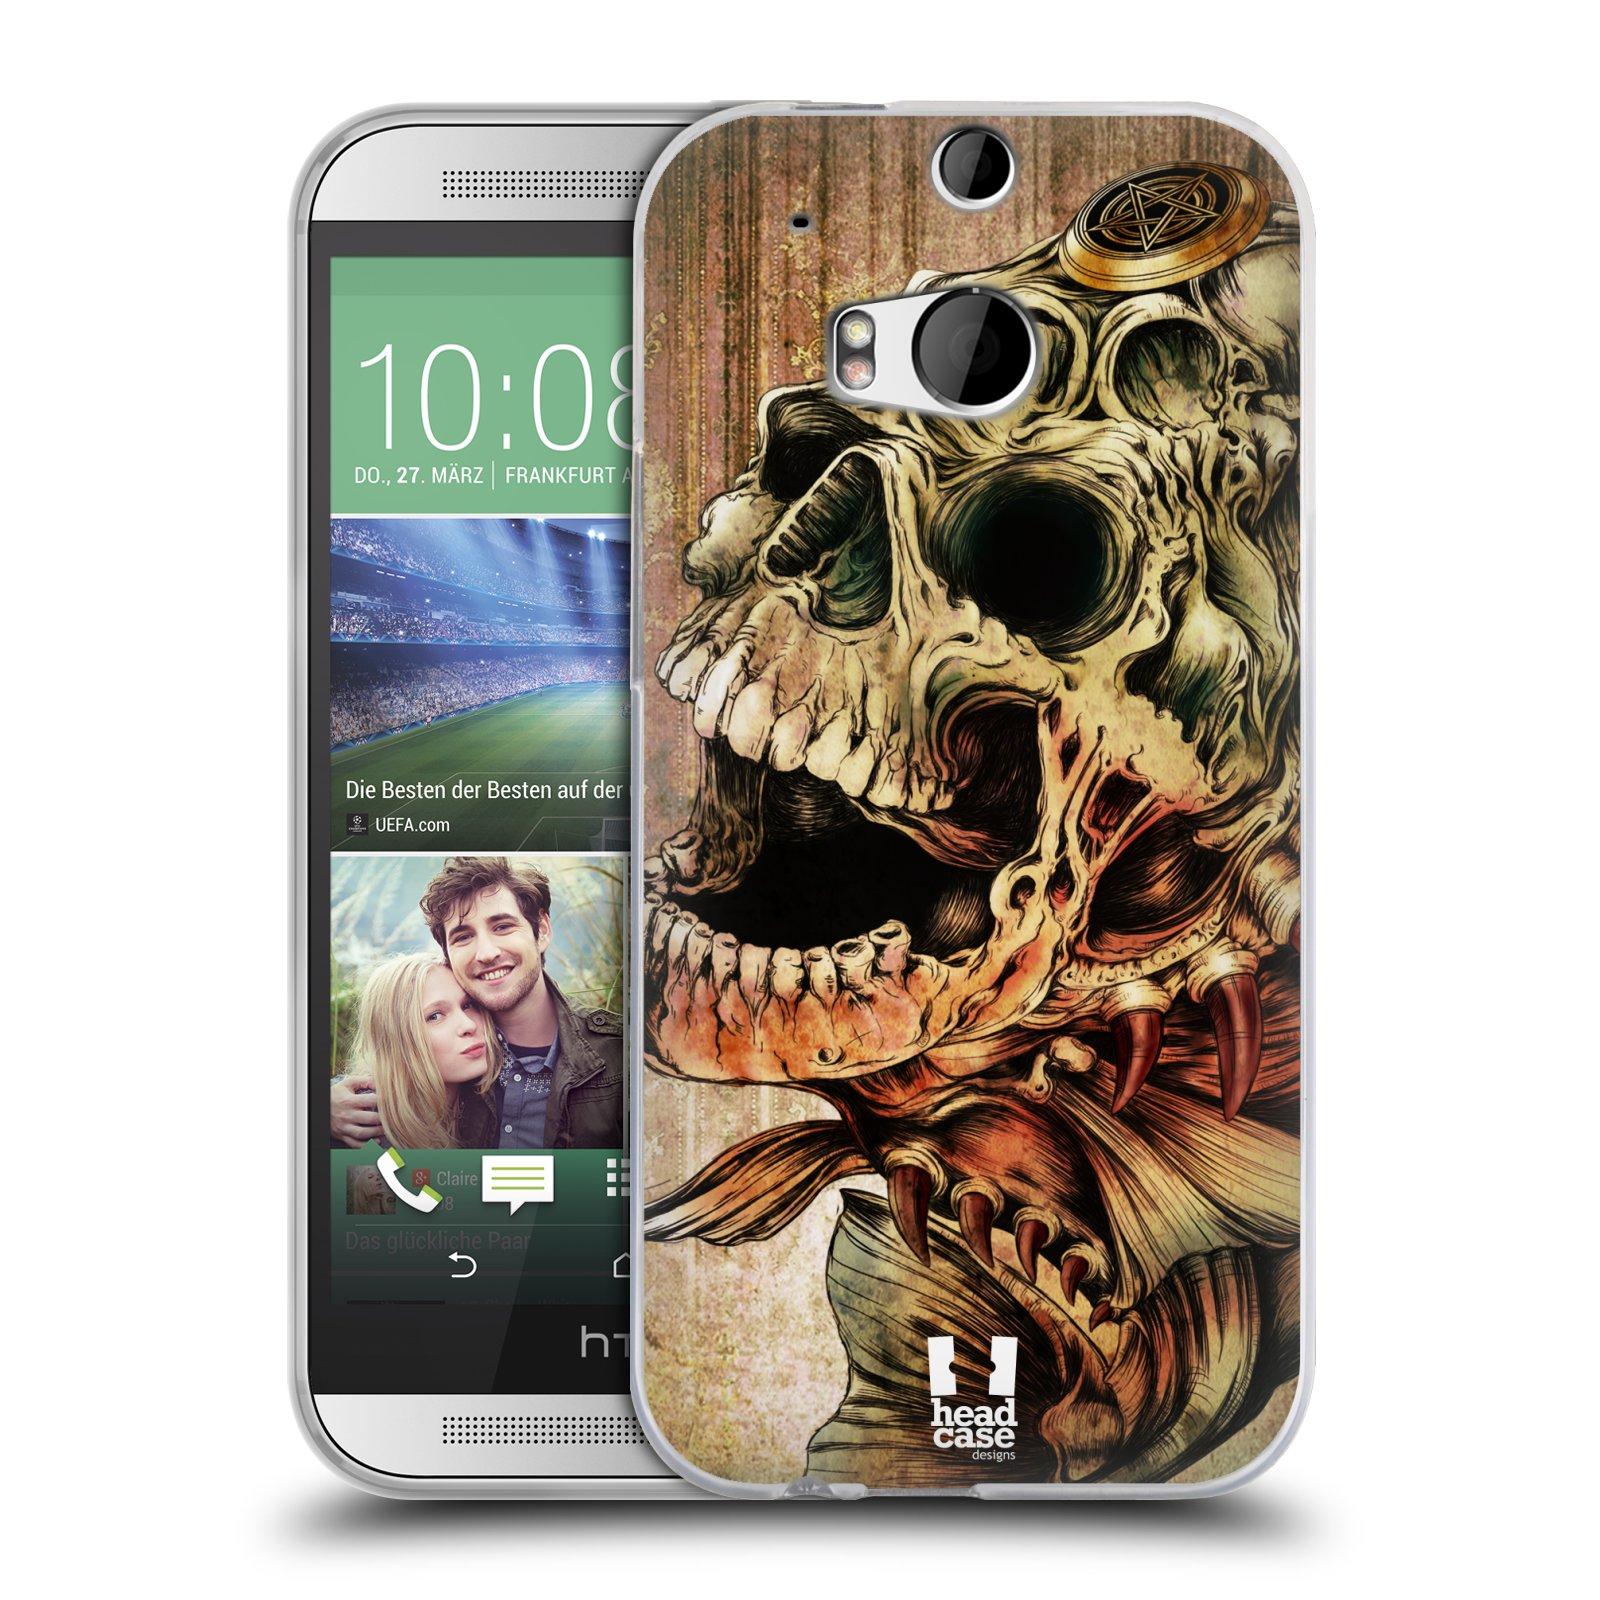 Silikonové pouzdro na mobil HTC ONE M8 HEAD CASE PIRANHA (Silikonový kryt či obal na mobilní telefon HTC ONE M8)